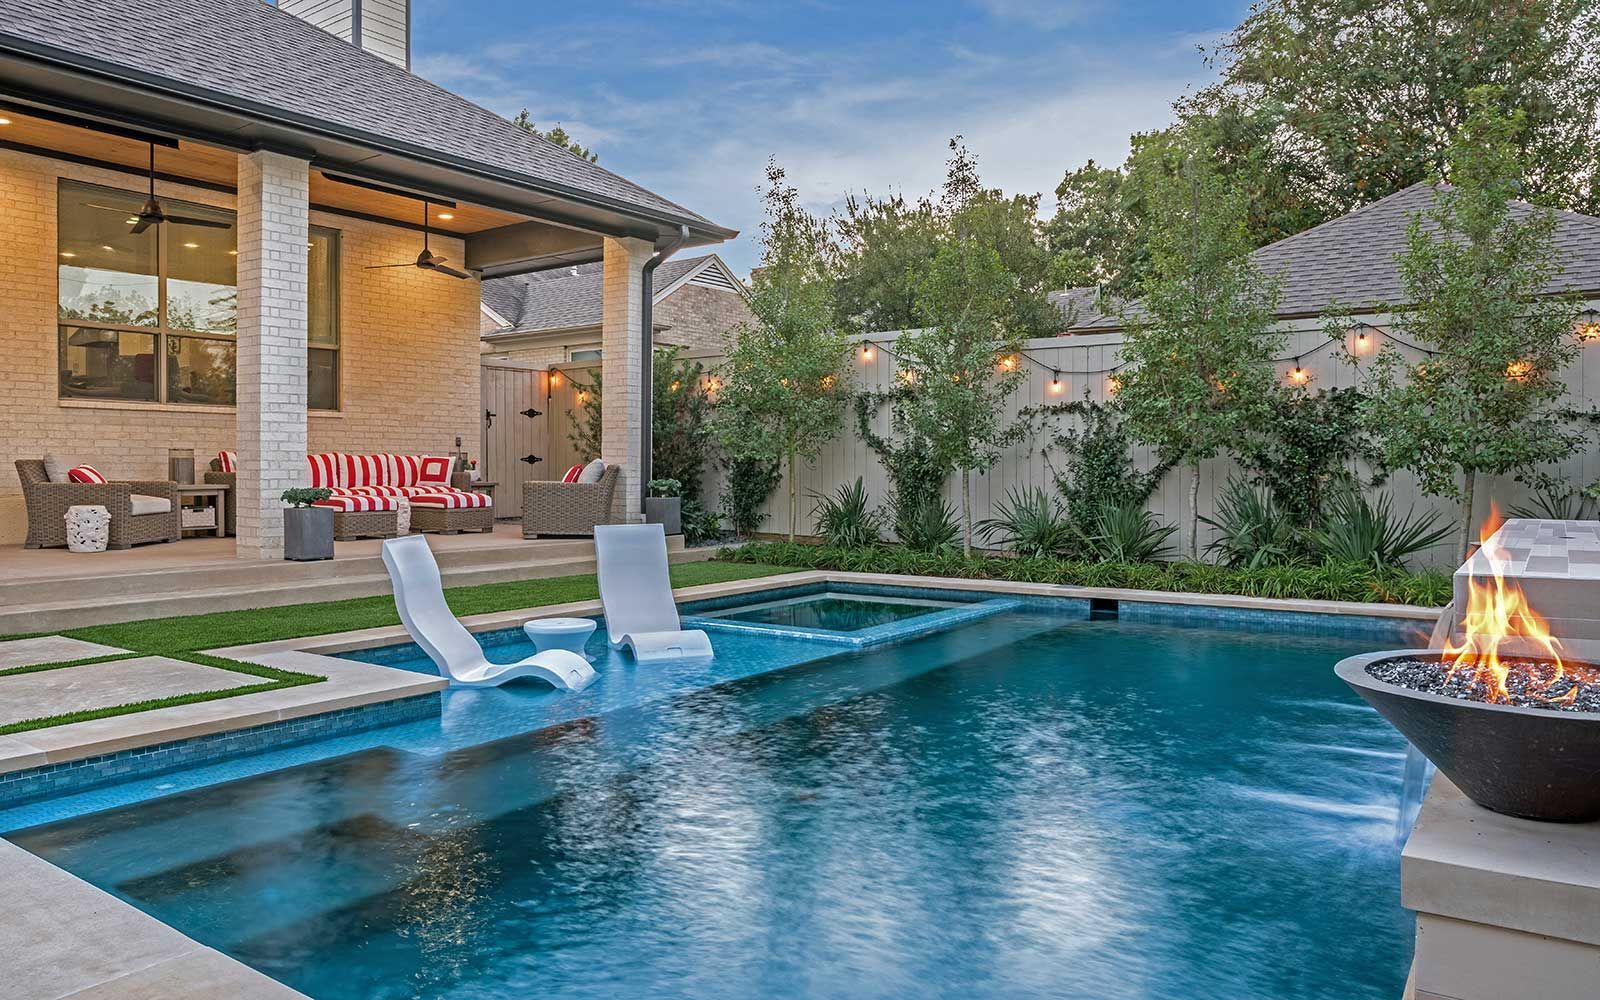 Ddla Design Dallas Landscape Architect Modern Pool Design Lakewood Neighborhood Ddladesign Pool Builders Small Pool Design Pools Backyard Inground